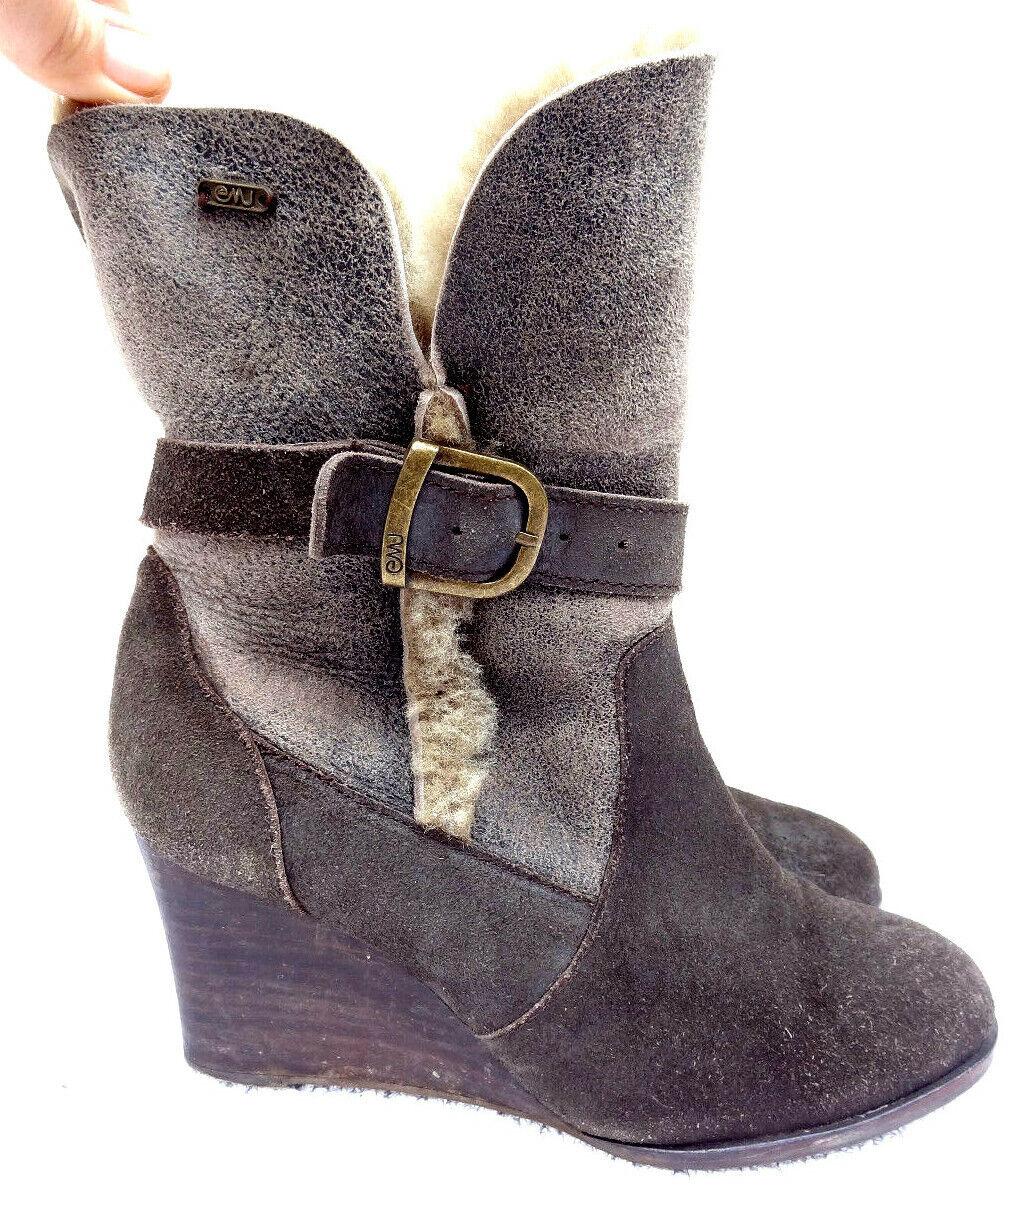 EMU Suede Sheepskin Lined wedge heel ankle Slouch Stiefel grau 6 - 39